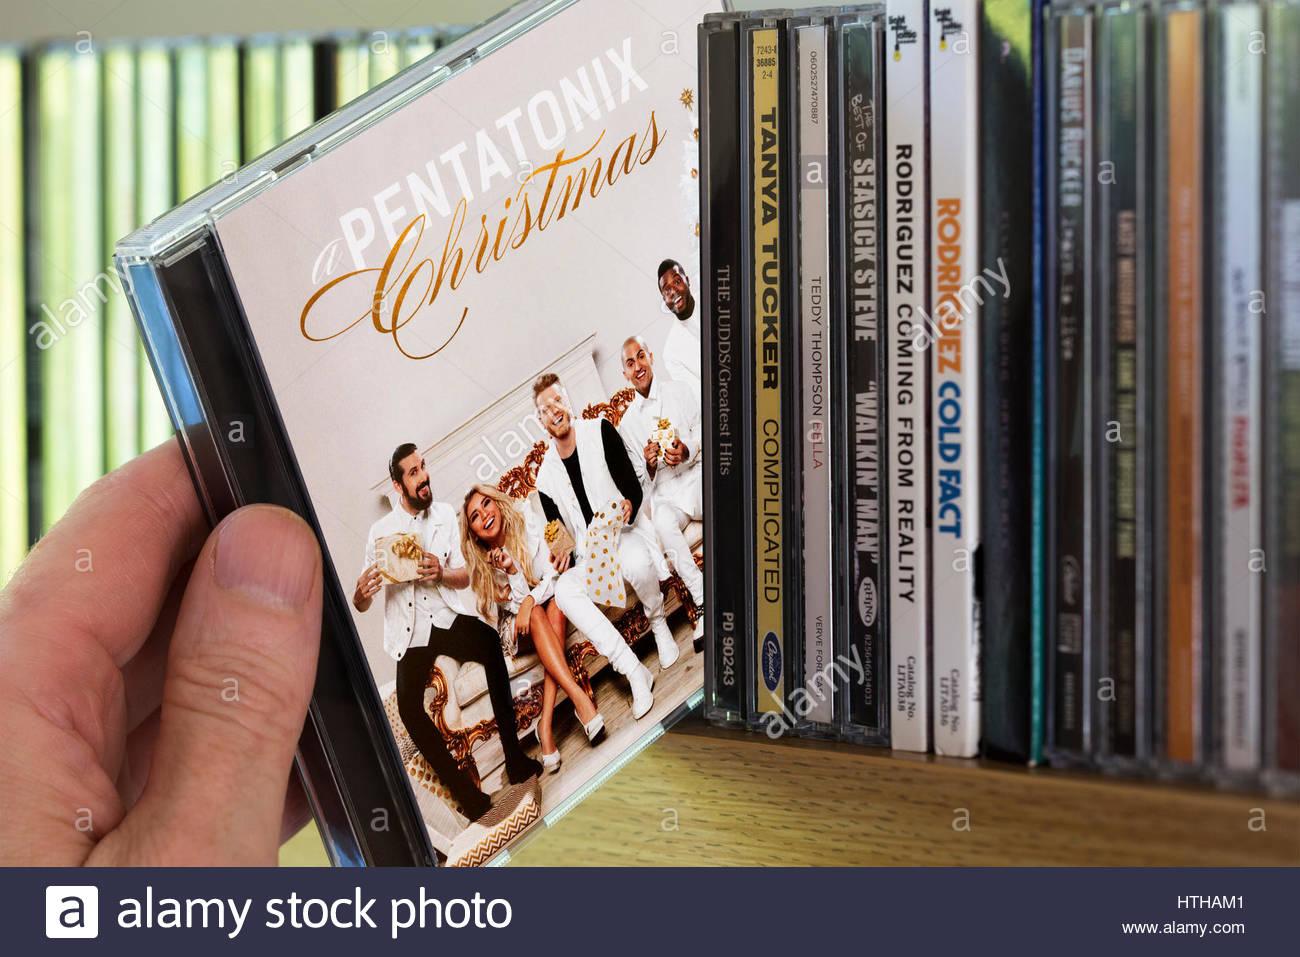 Pentatonix Christmas Cd 2019.A Pentatonix Christmas Stock Photos A Pentatonix Christmas